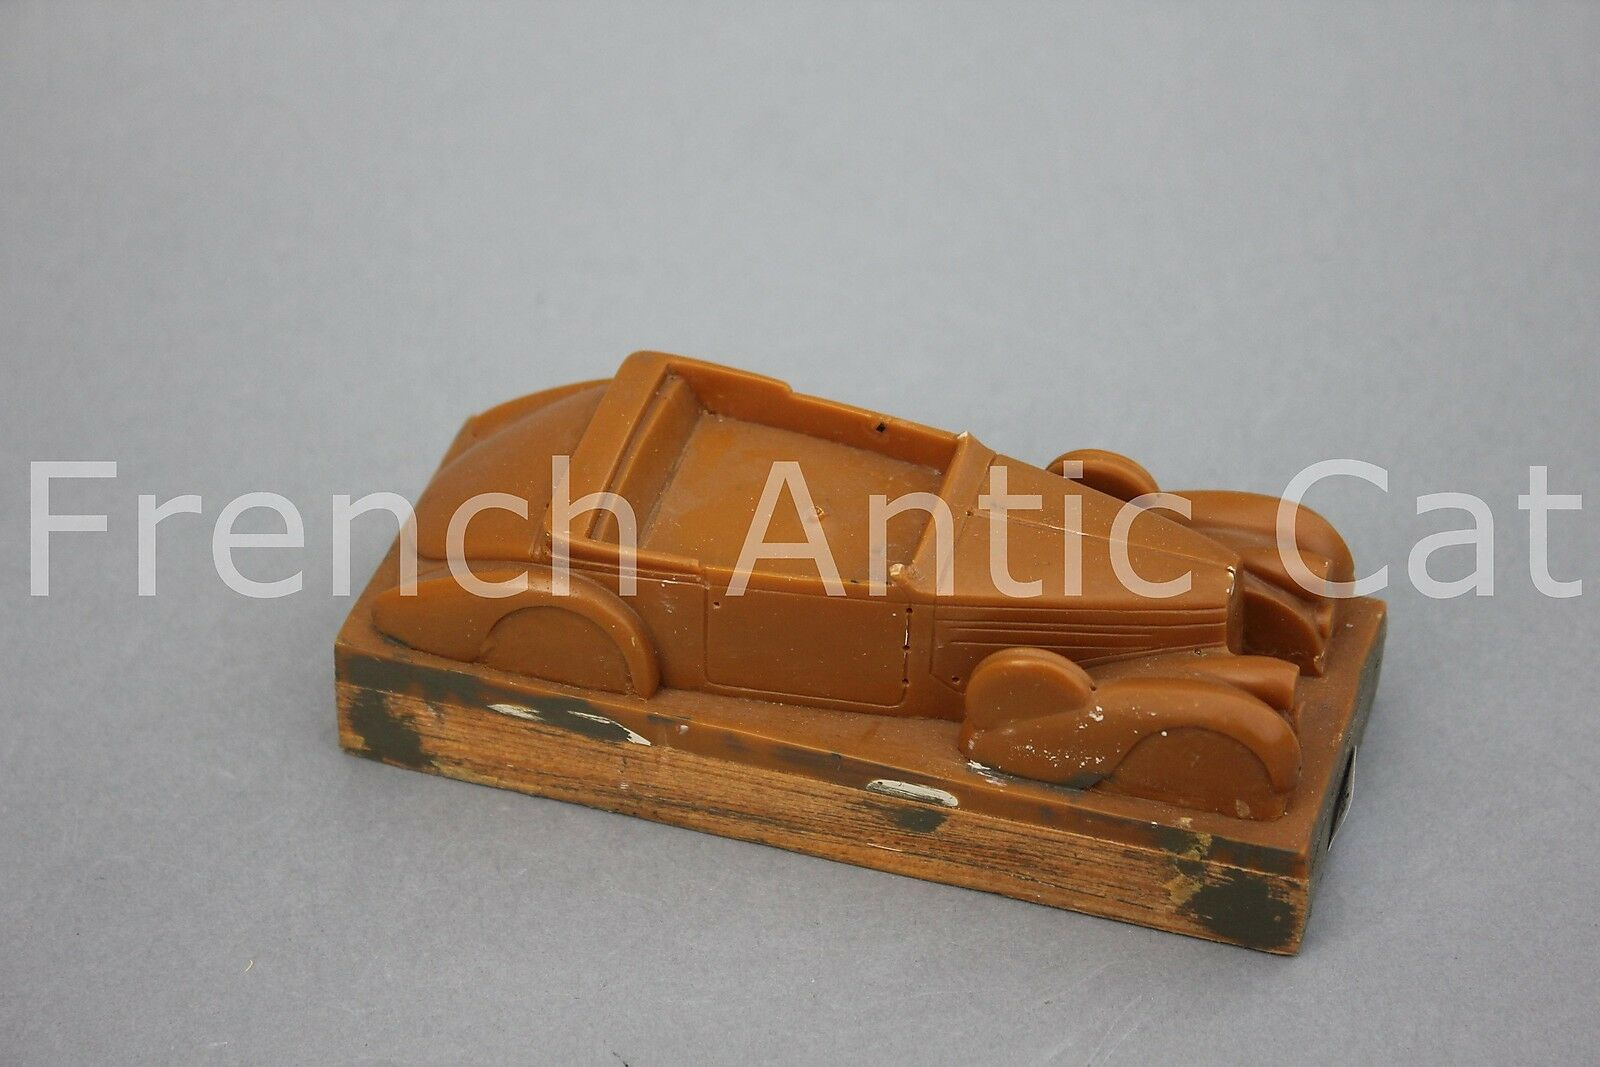 Rare Die Mold Predotype Resin Bugatti Cabriolet 57 C1 1 43 Heco Models Wu